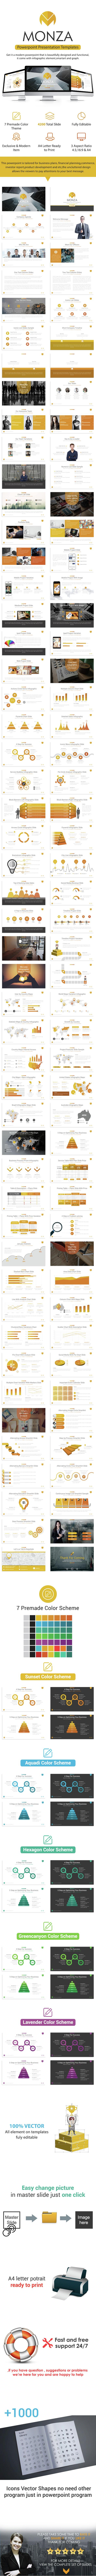 MONZA - Presentation Template - Clean & Modern  - Business PowerPoint Templates